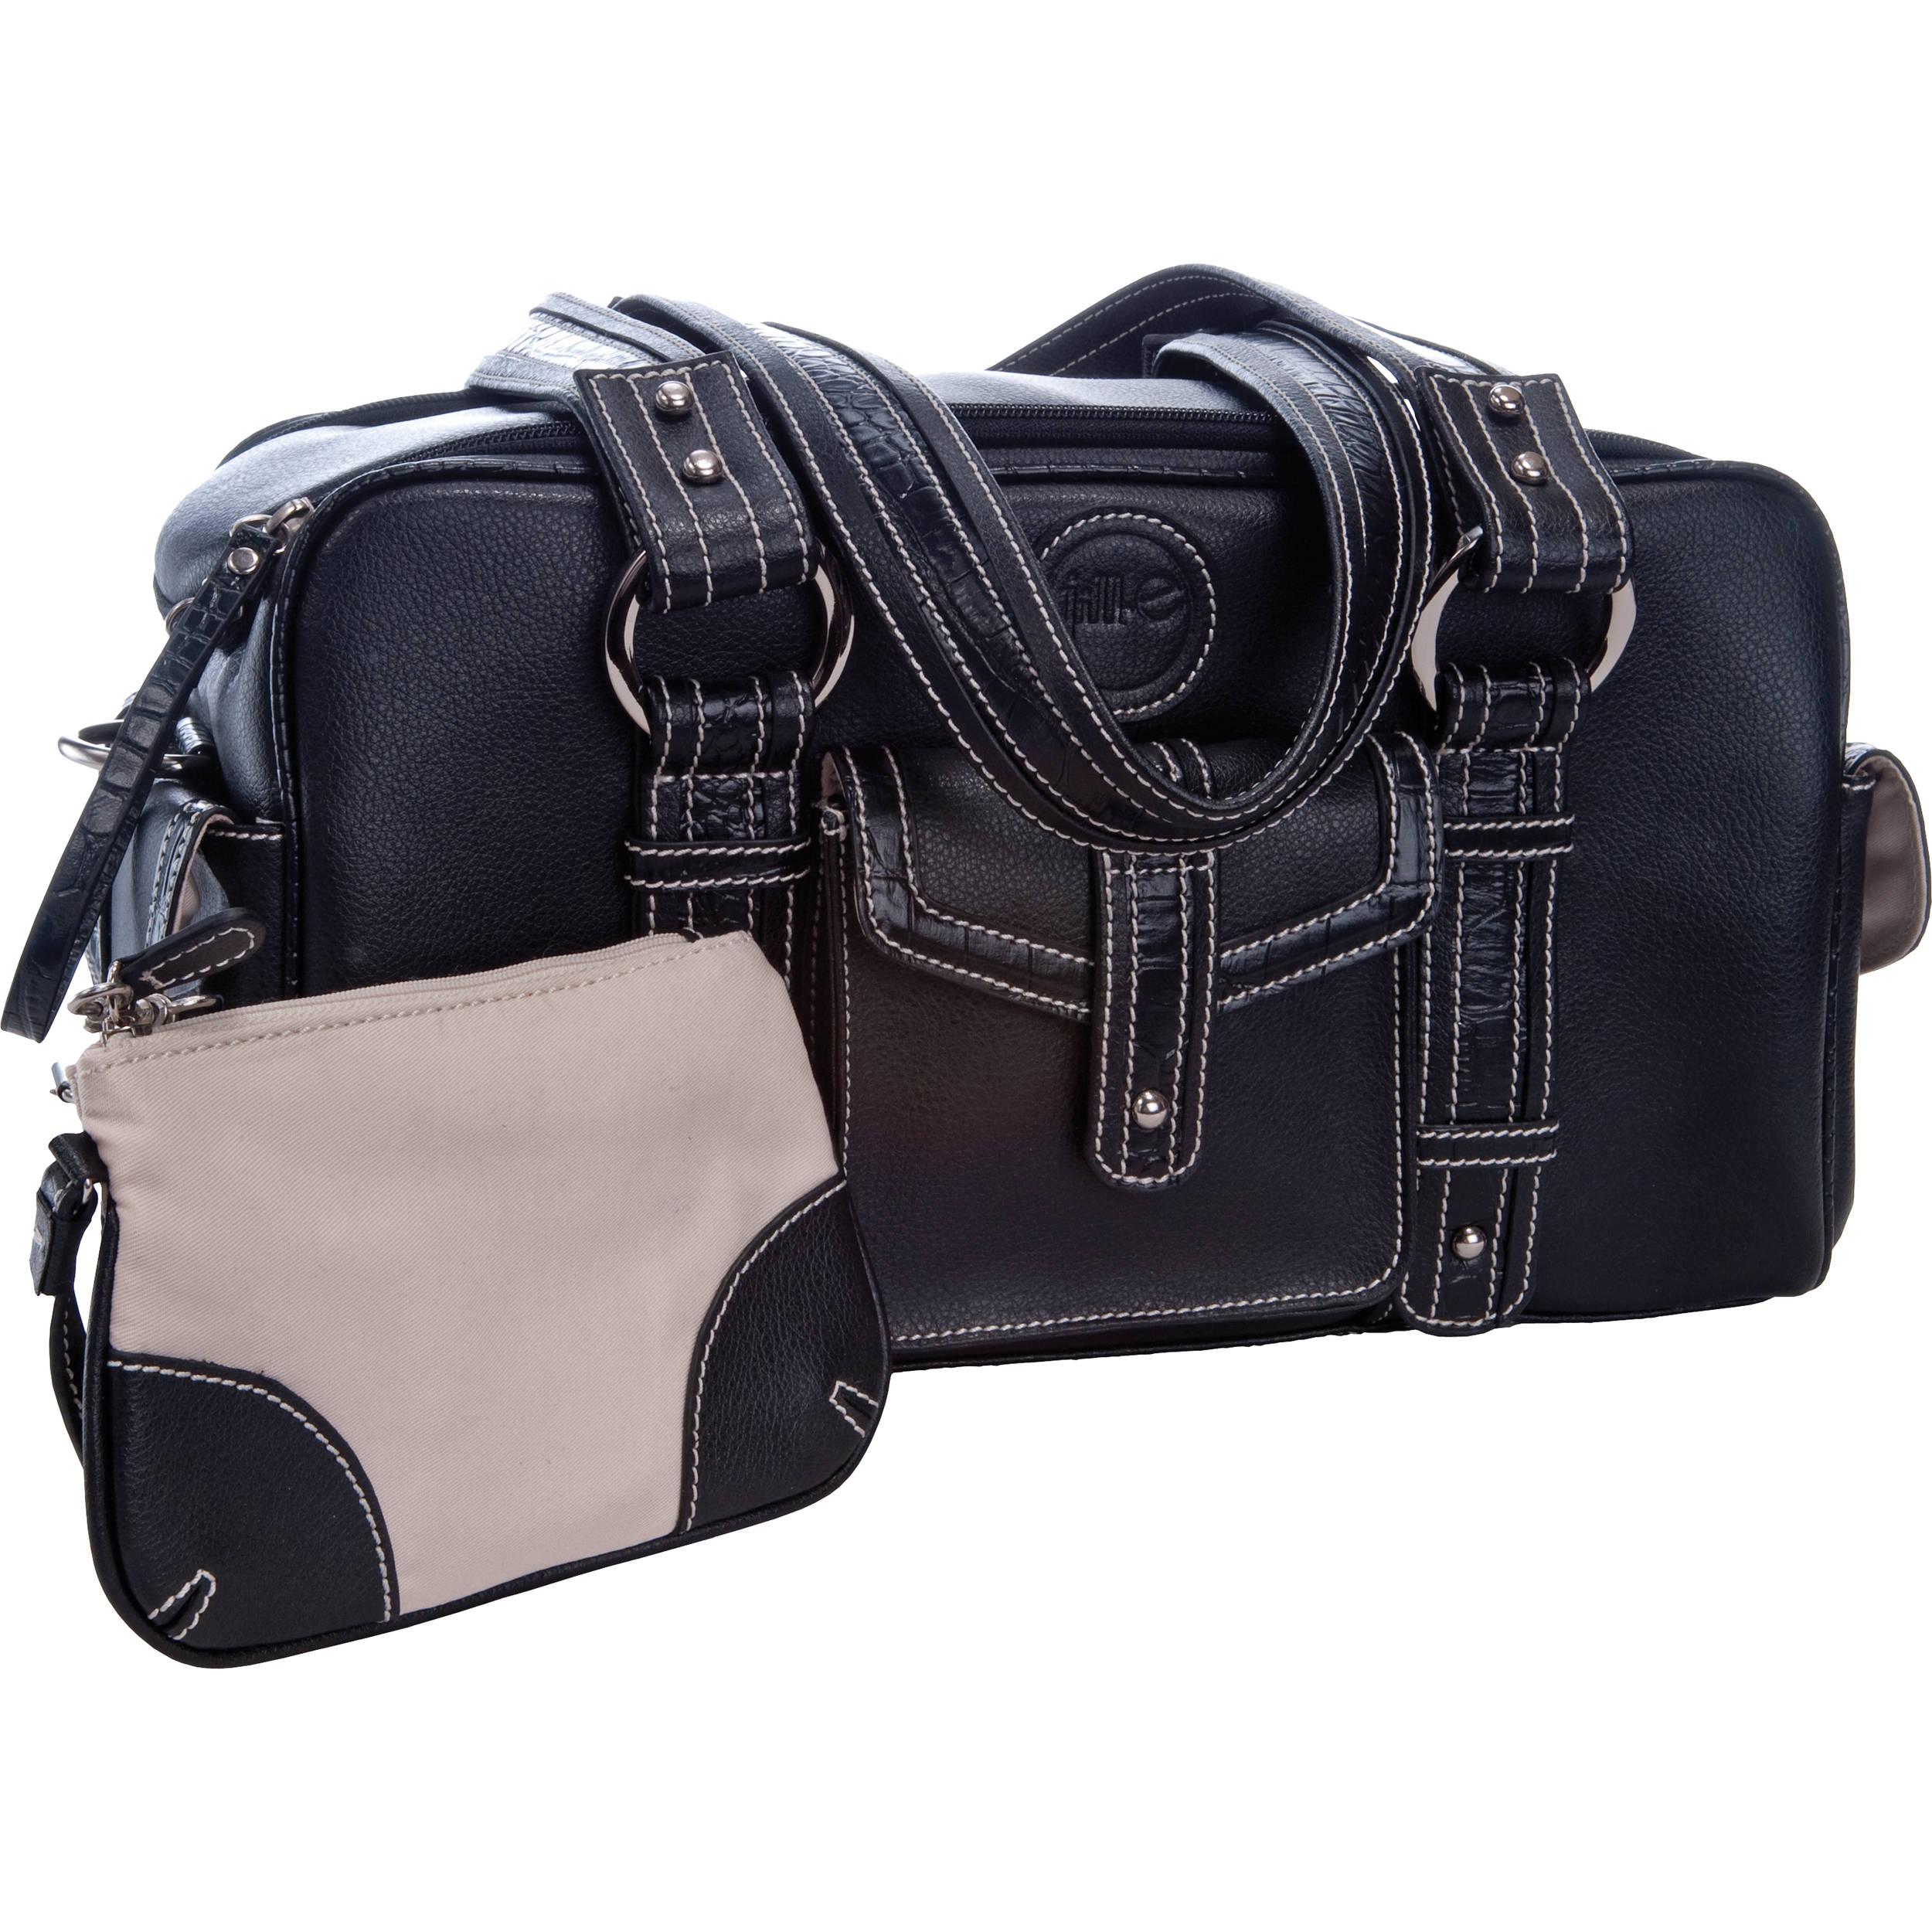 Jill E Designs Small Camera Bag Black With Croc Trim